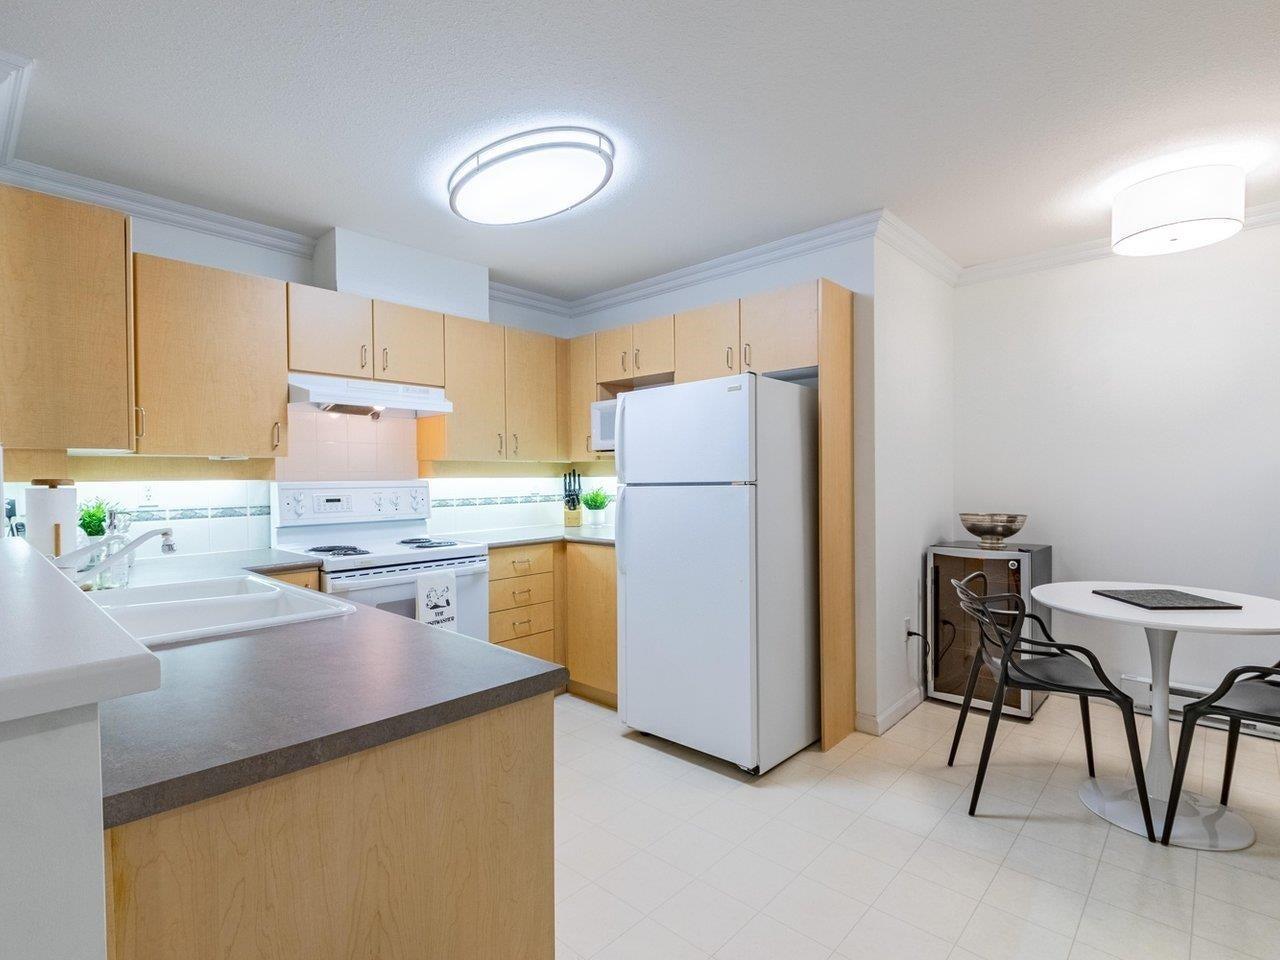 306 15298 20 AVENUE - King George Corridor Apartment/Condo for sale, 2 Bedrooms (R2625551) - #5